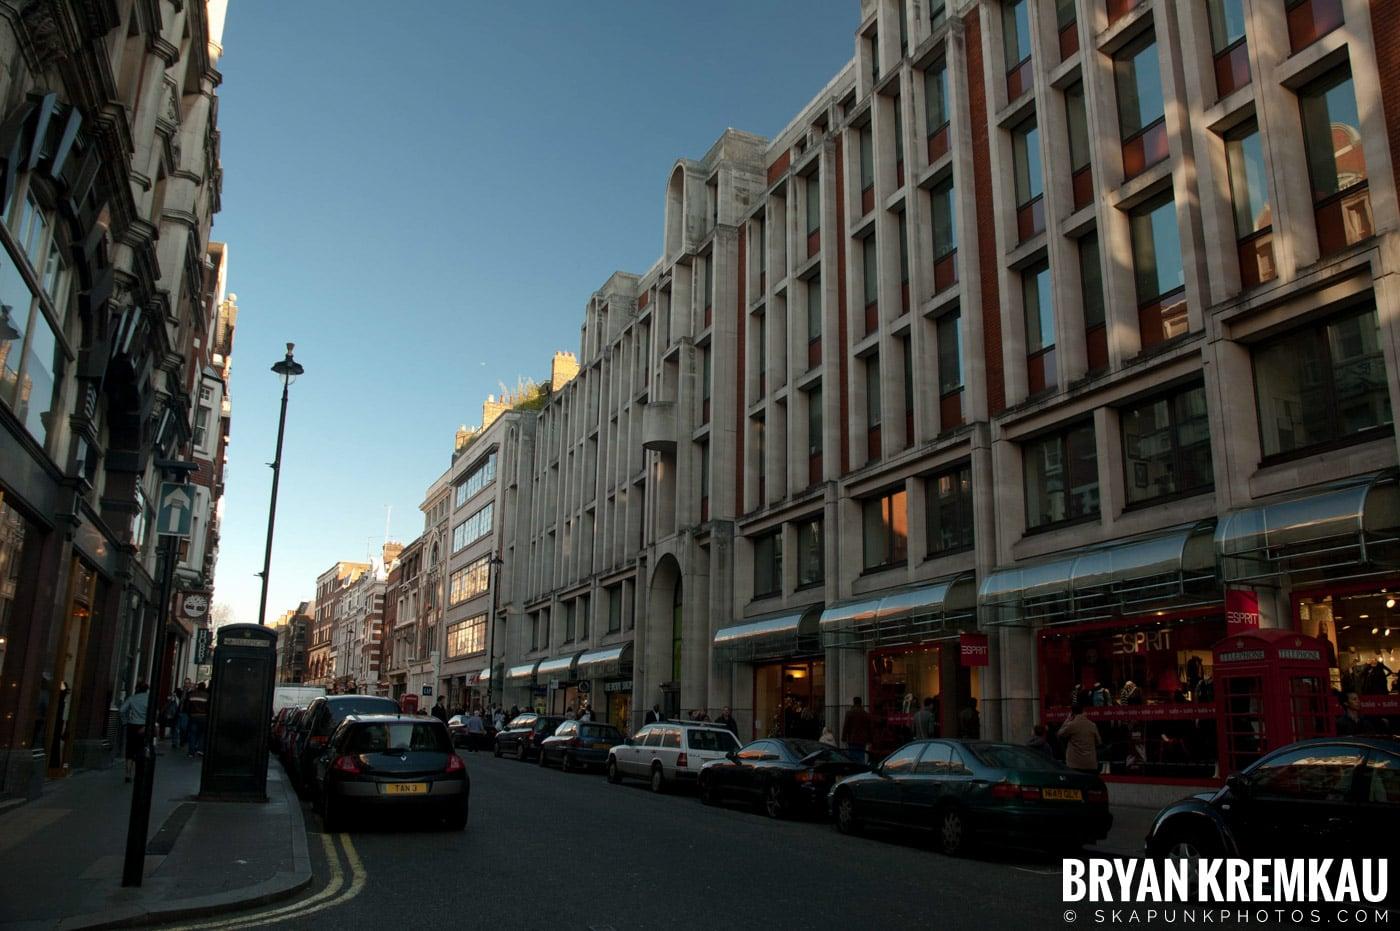 London, England - Day 5 - 12.17.06 (4)